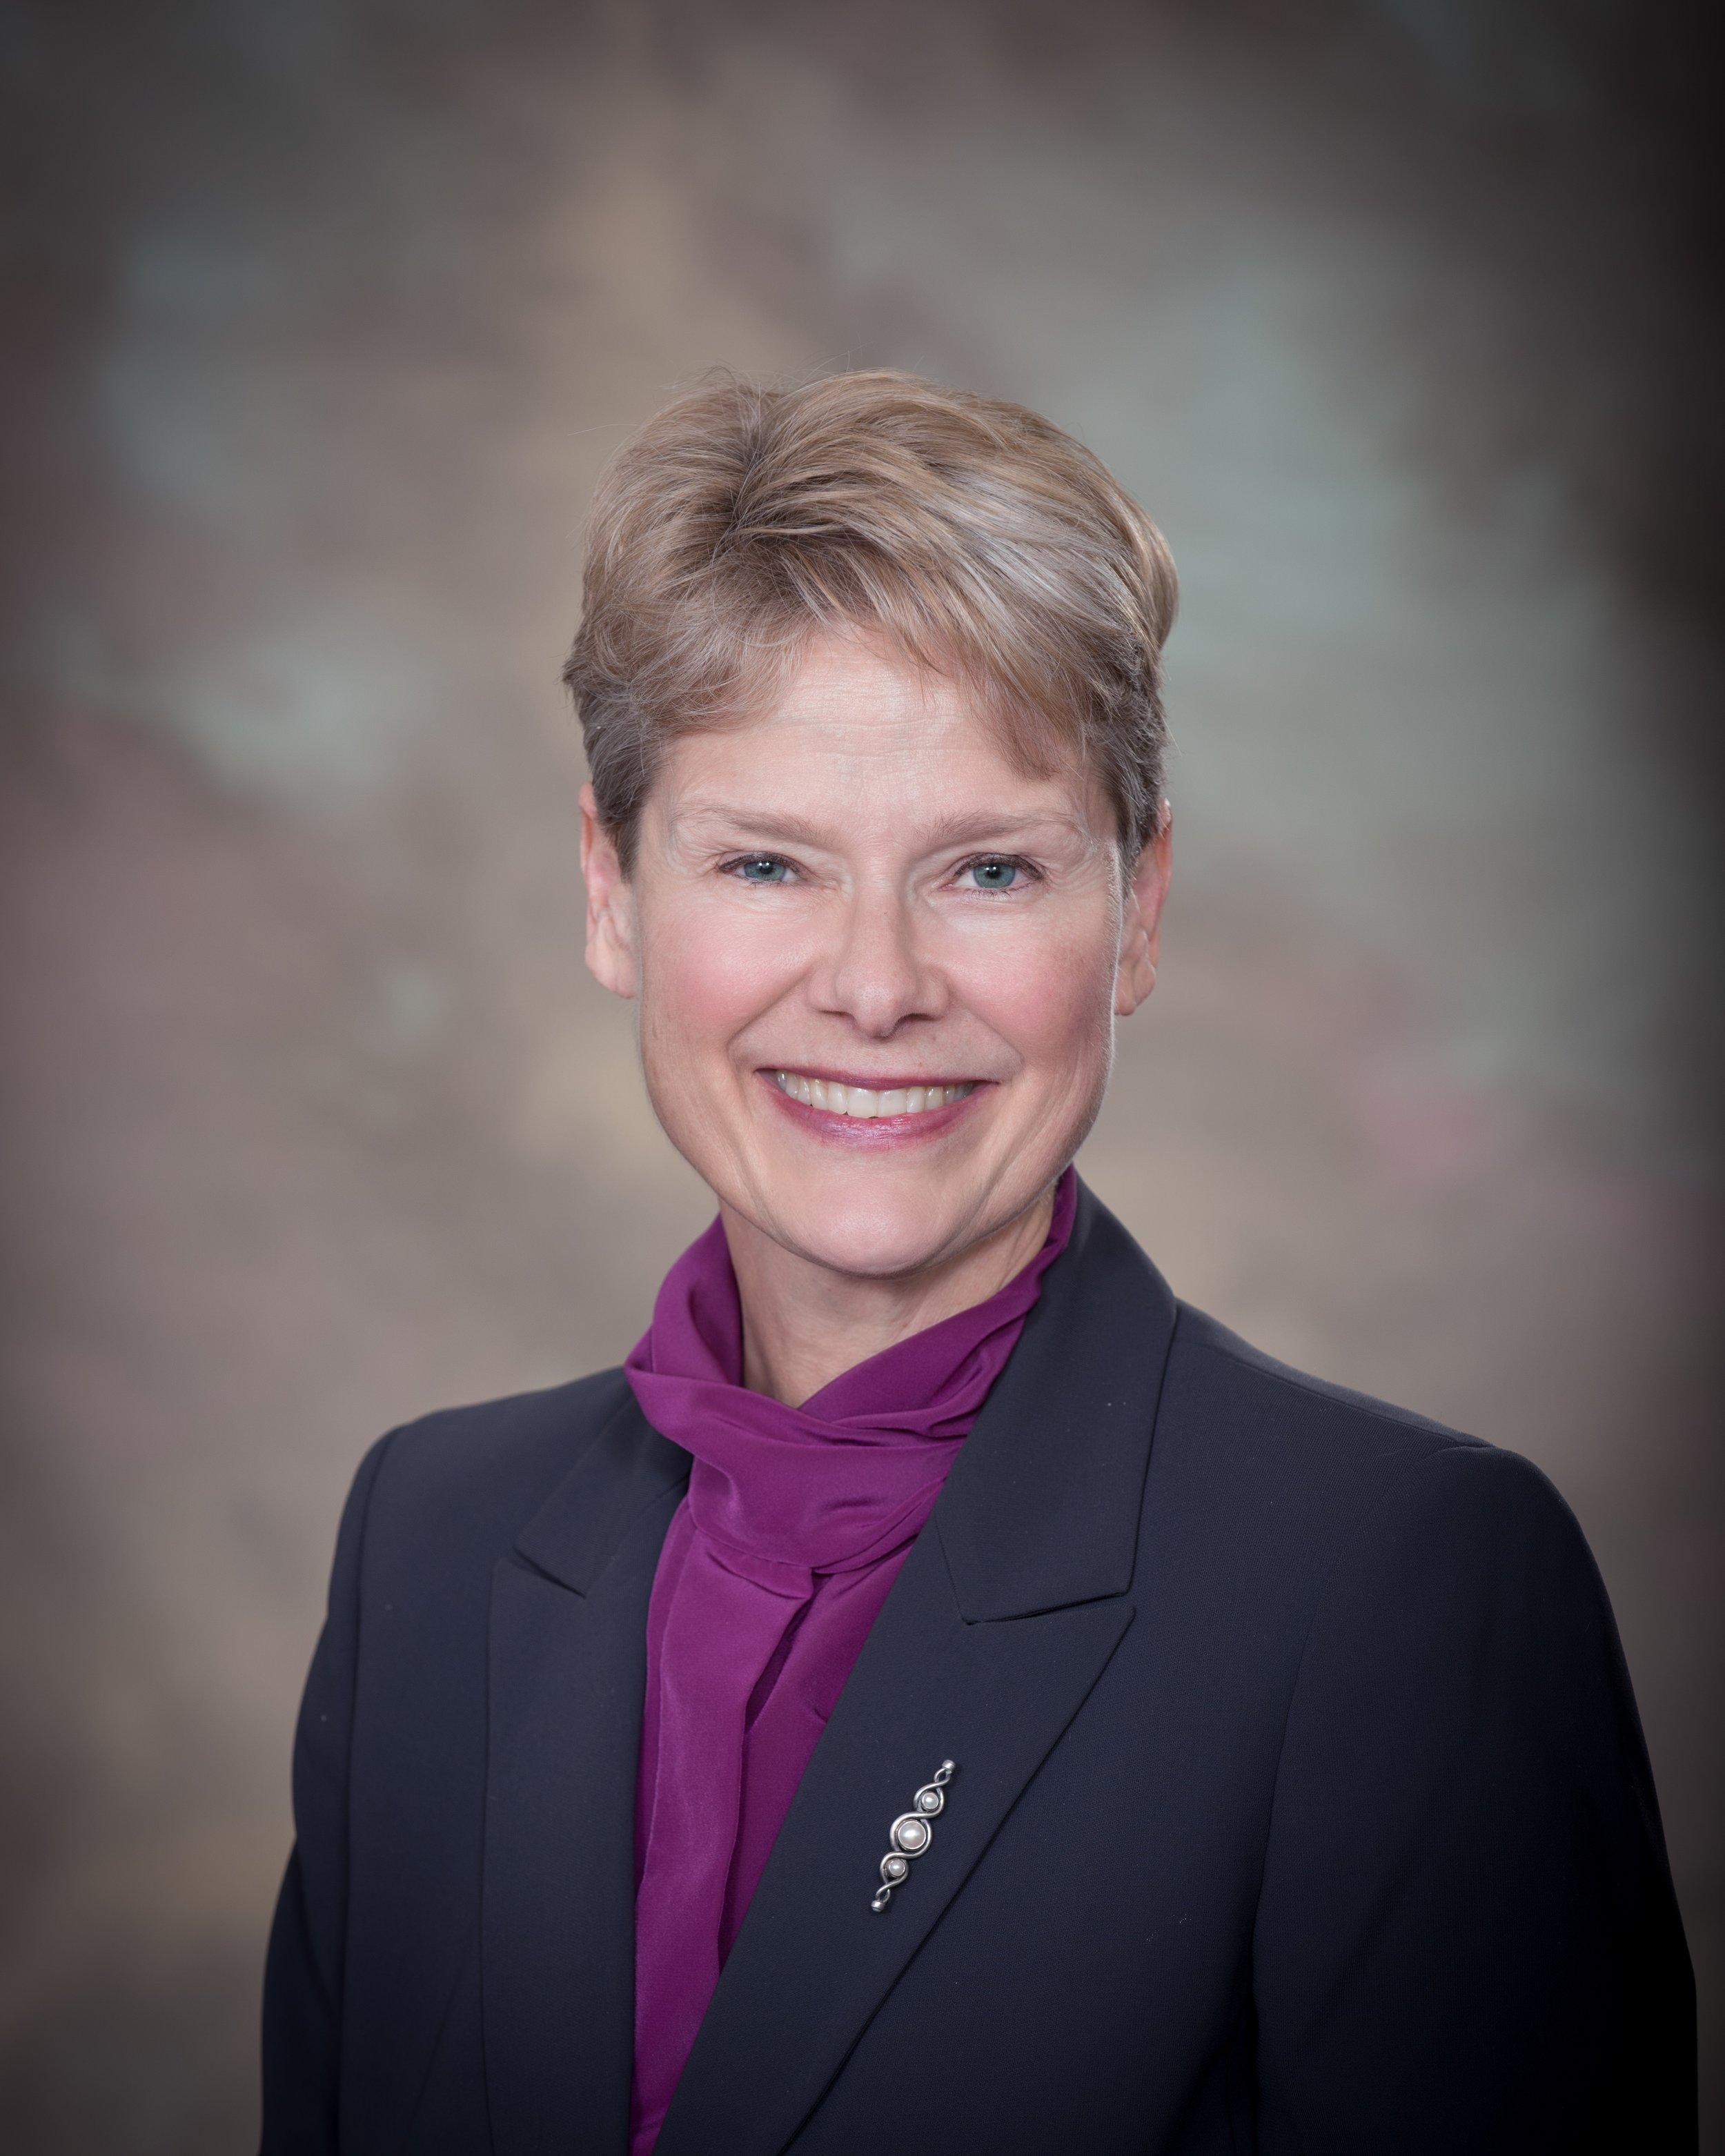 Carol Siemon, Ingham County Prosecutor